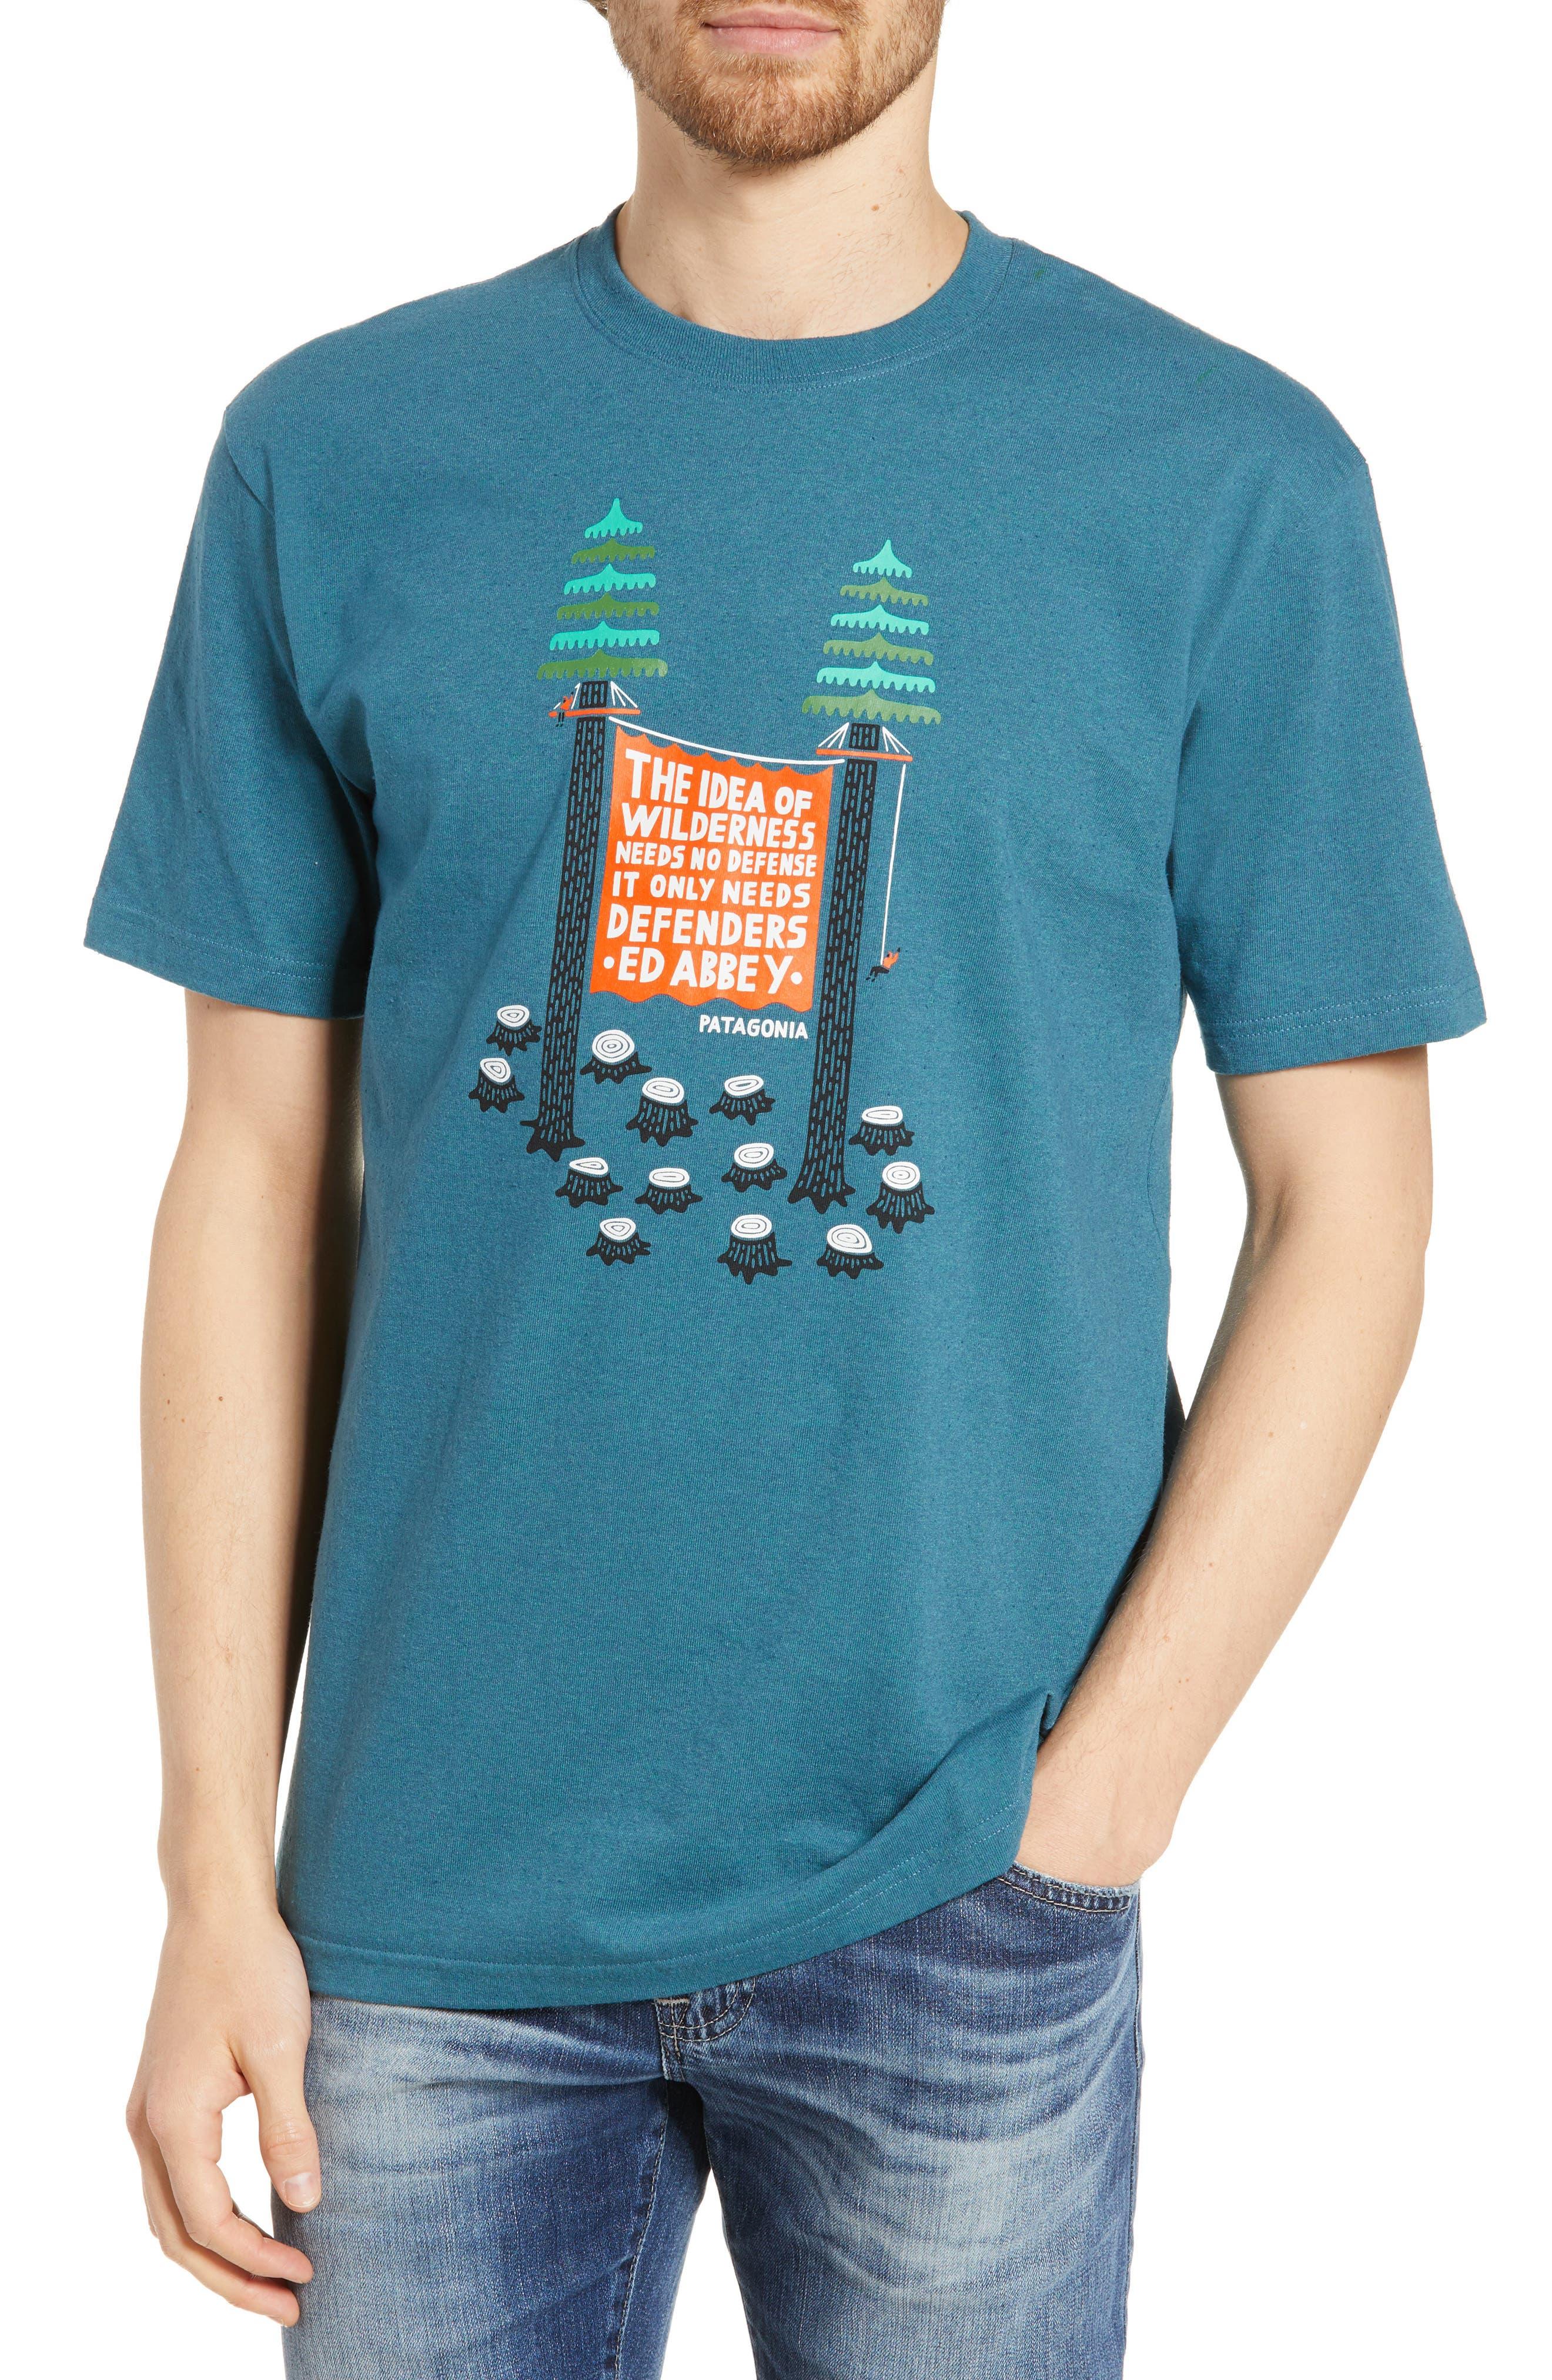 Patagonia Treesitters Responsibili-Tee Graphic T-Shirt, Blue/green